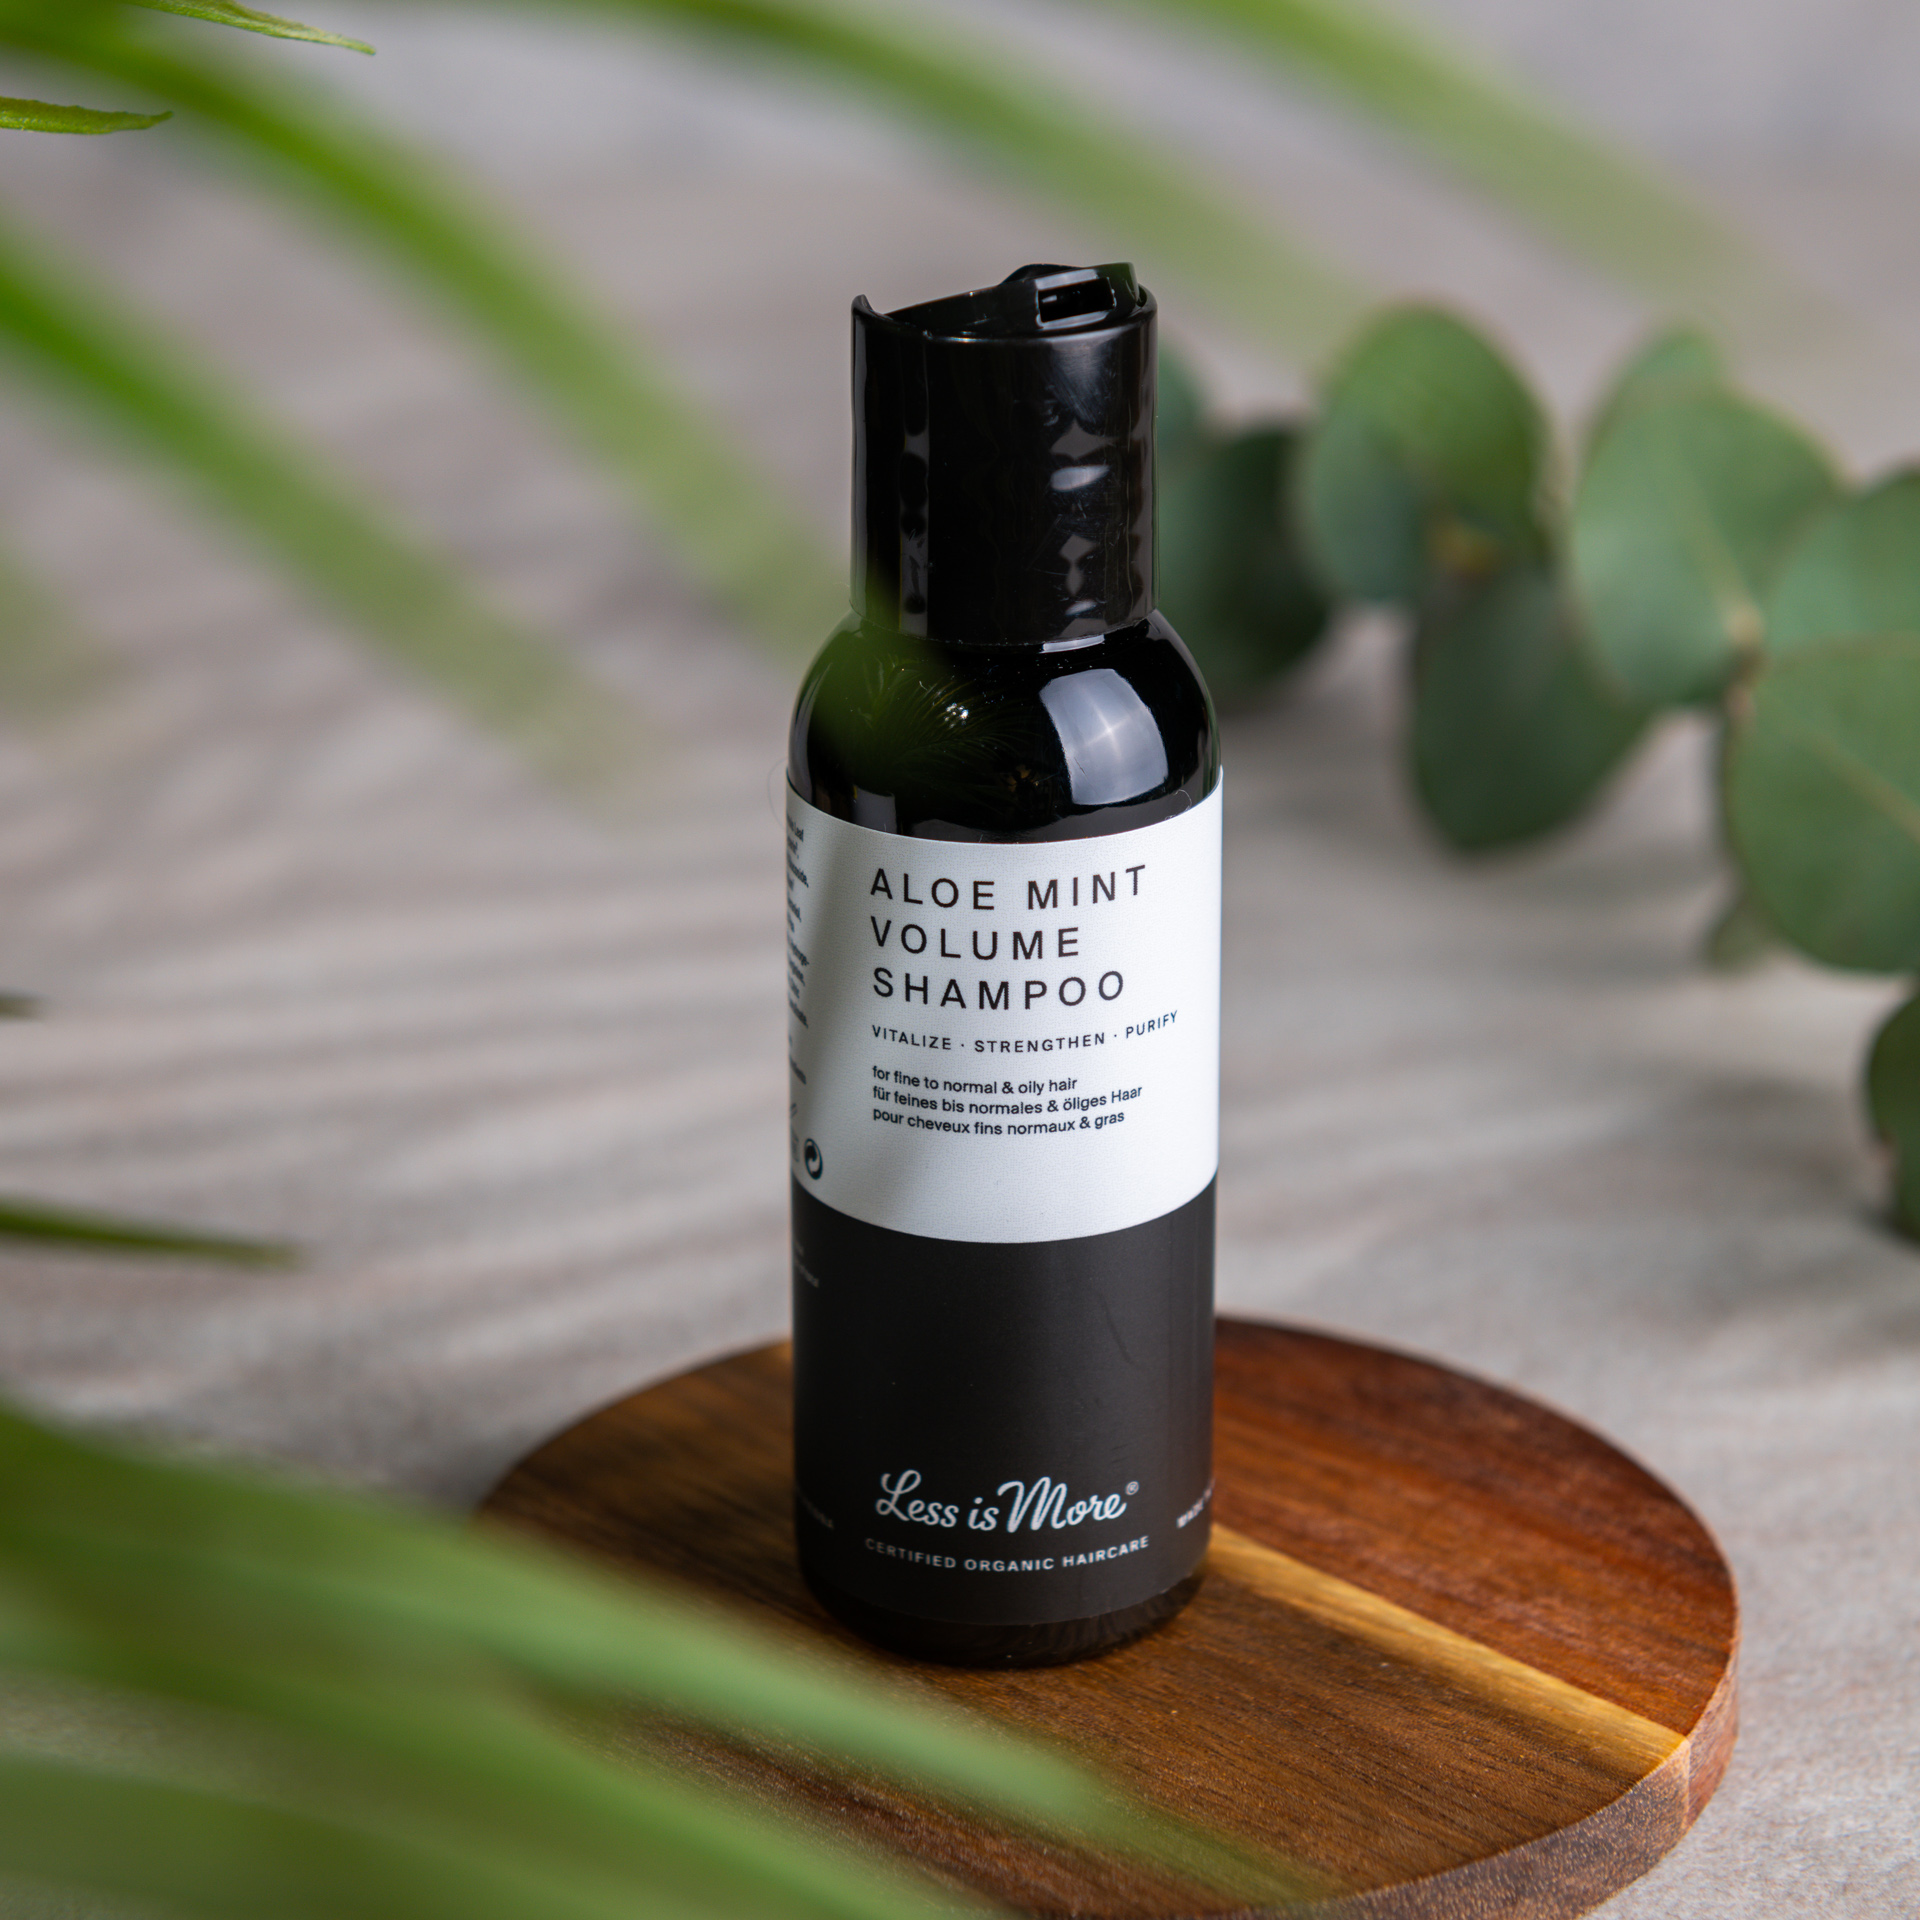 Aloe Mint Volume Shampoo Travel Size